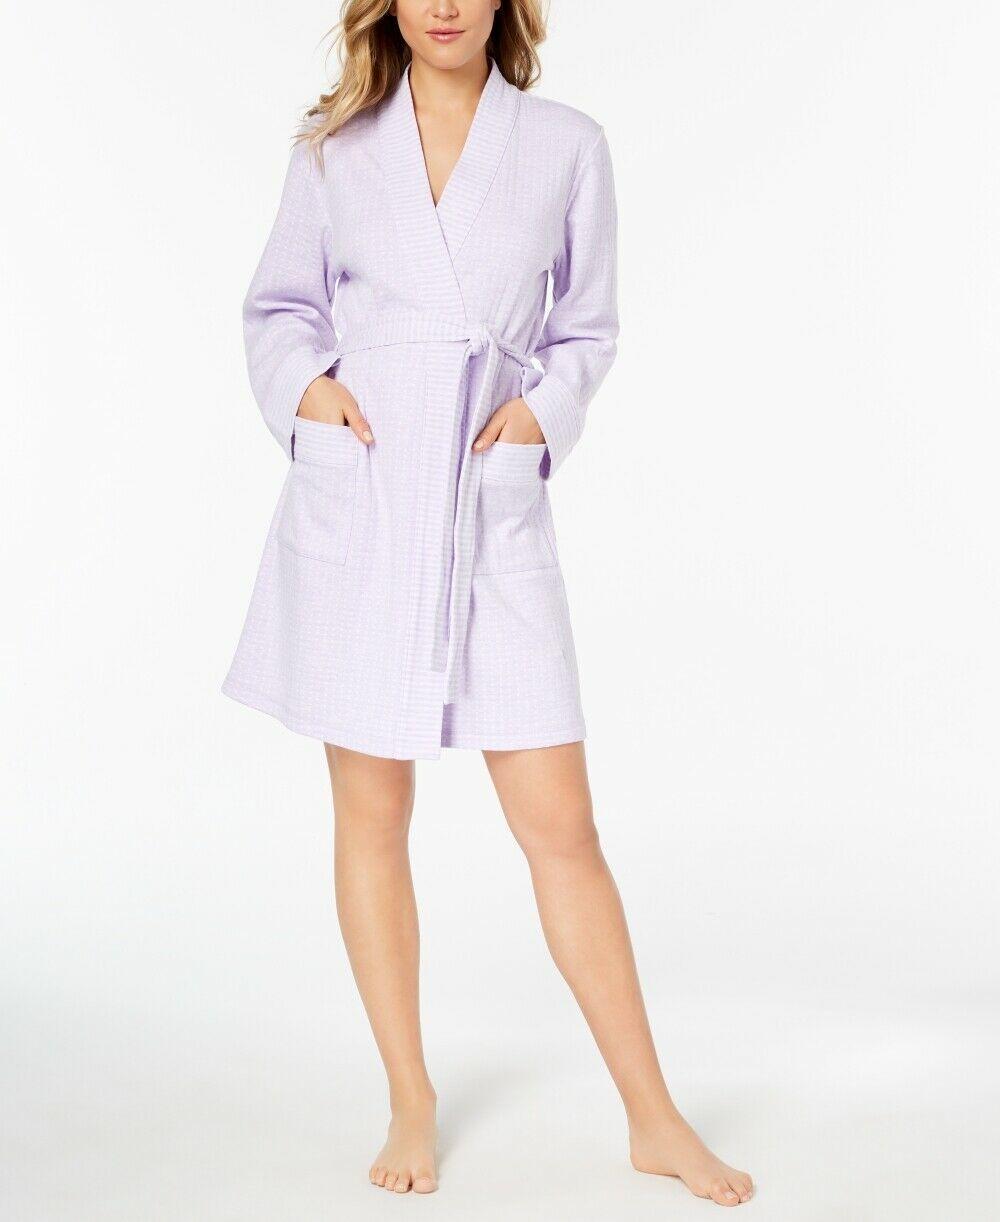 Charter Club Womens Intimates Knit Short Robe Light